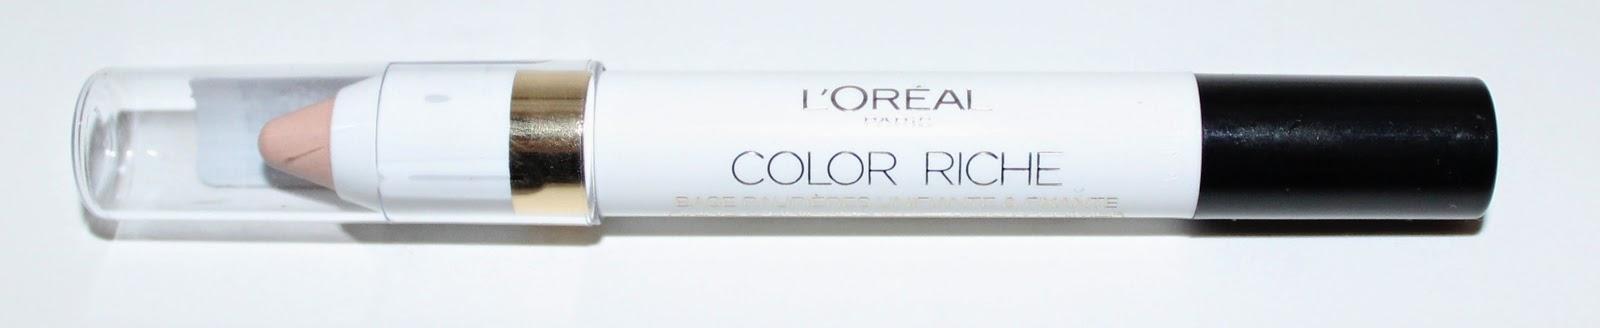 L'Oreal Colour Riche Eye Shadow Primer